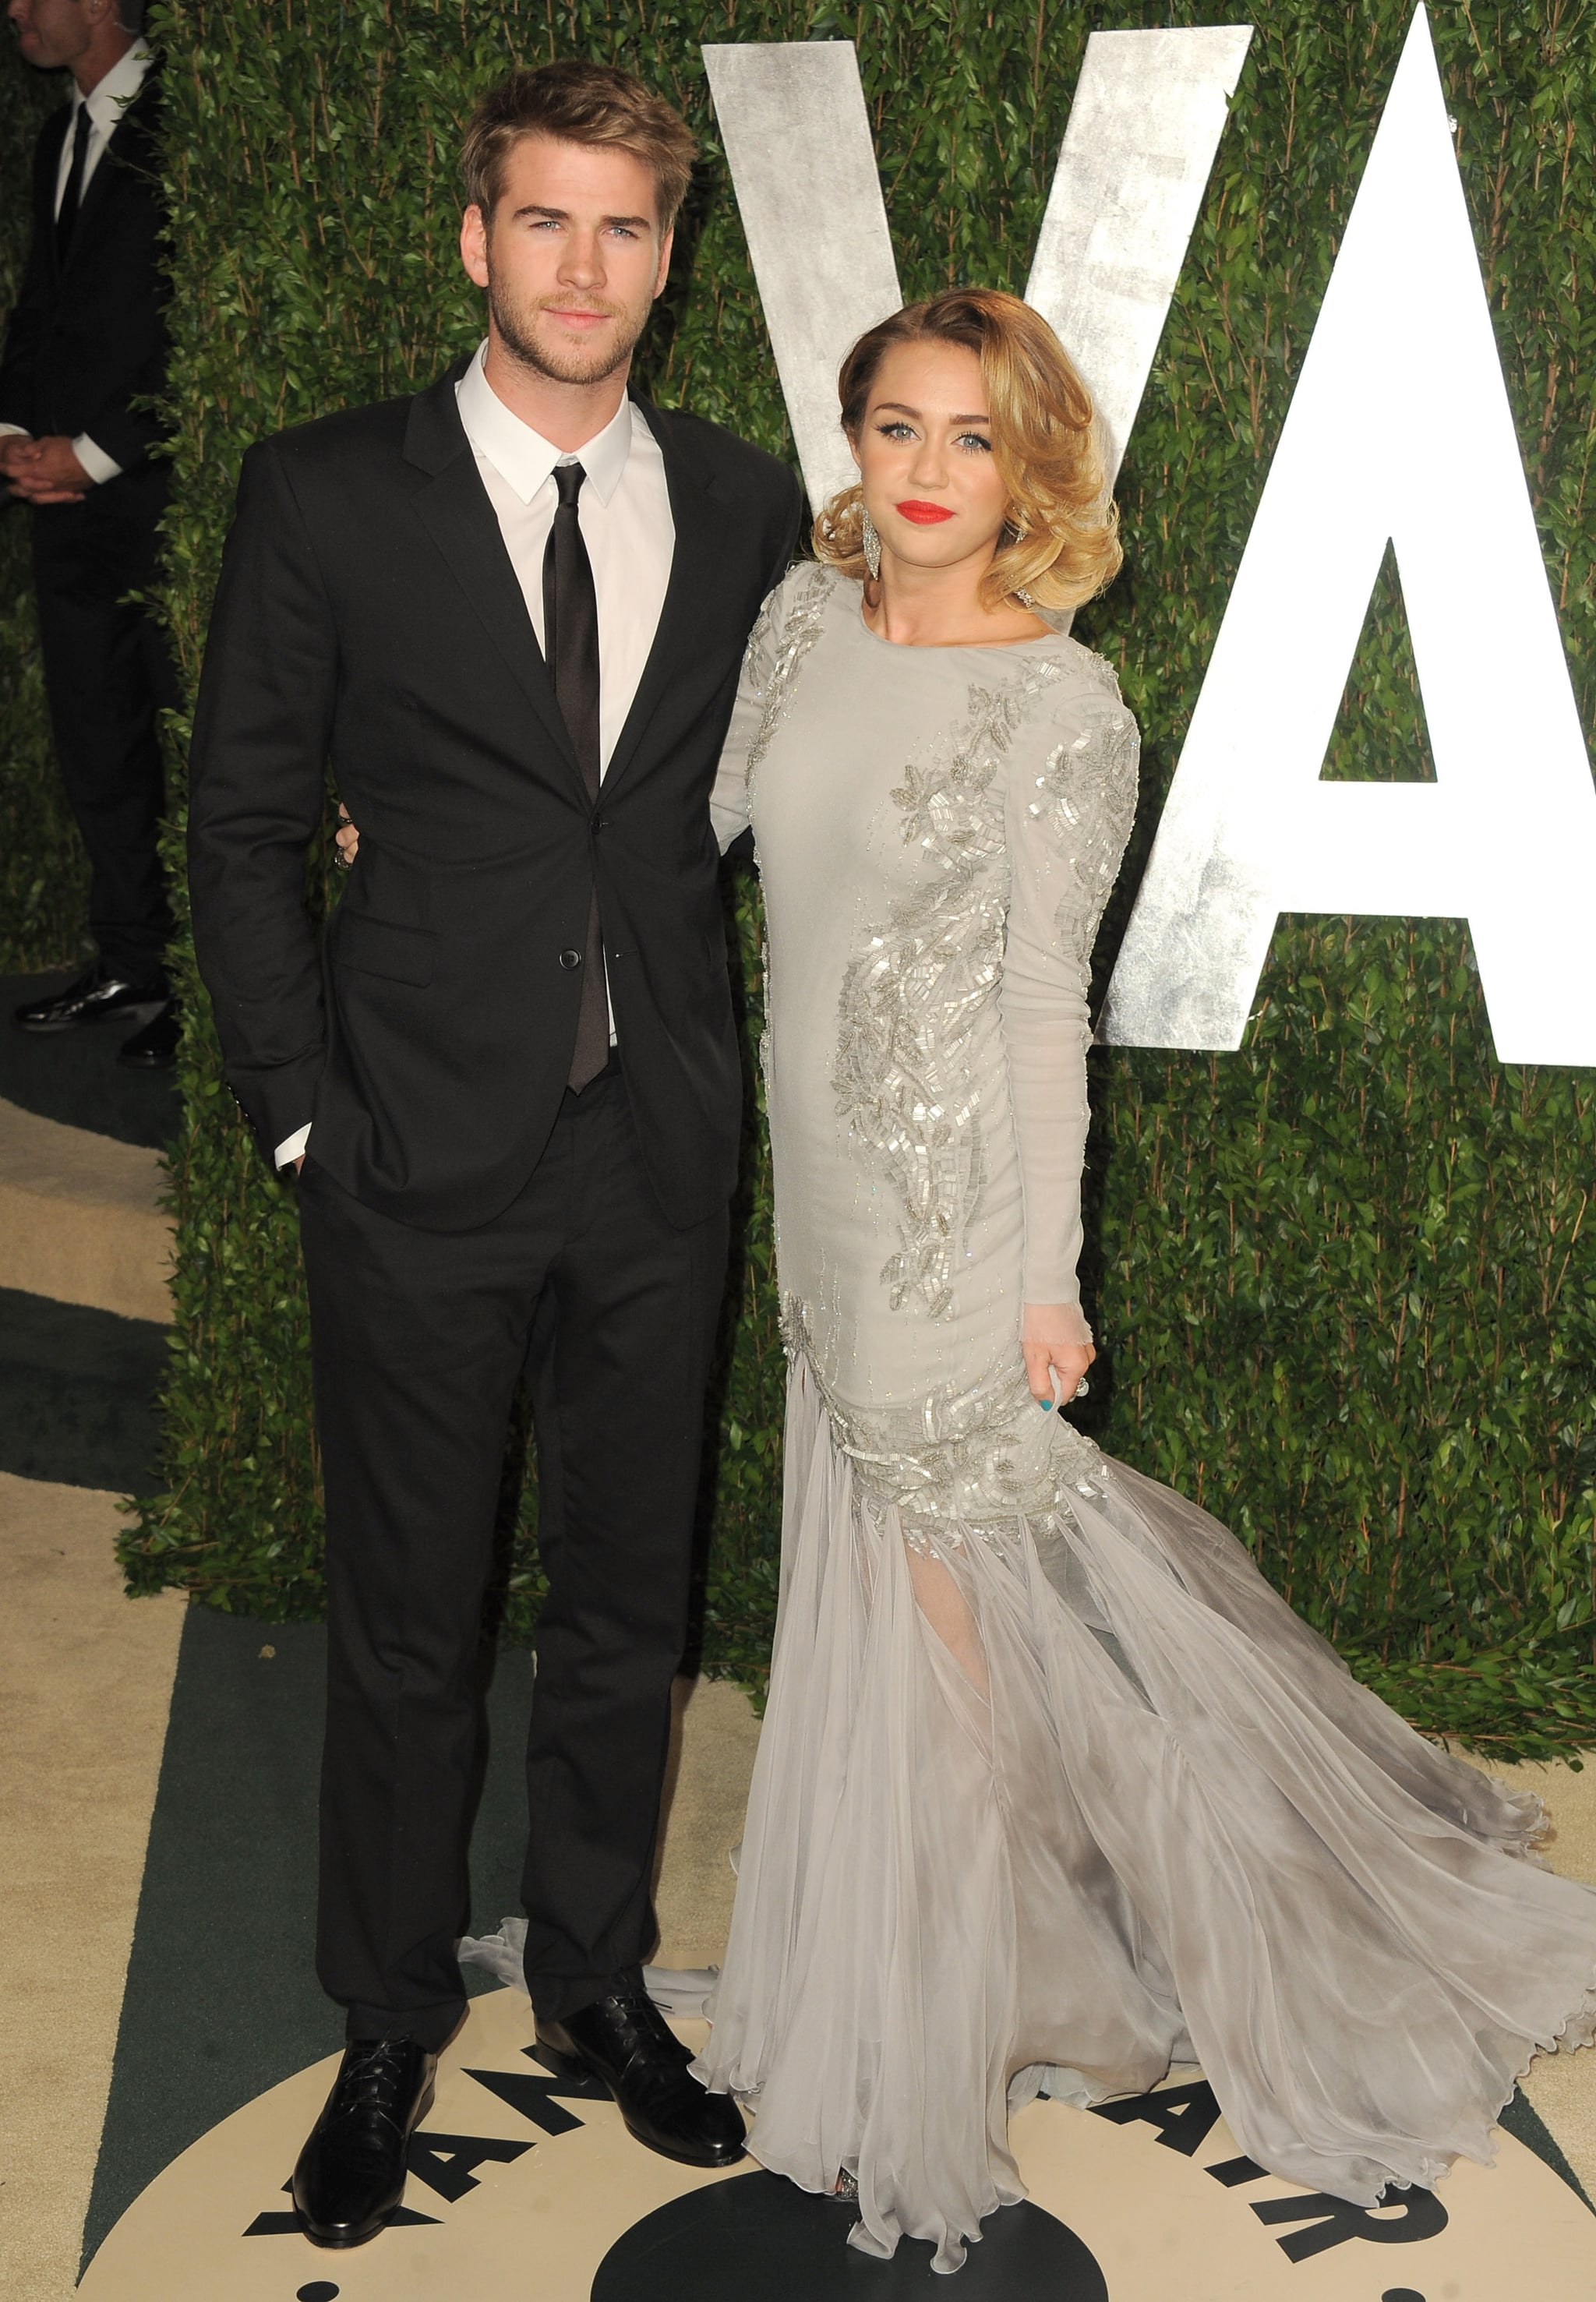 Miley Cyrus and Liam Hemsworth strike a post at Vanity Fair.